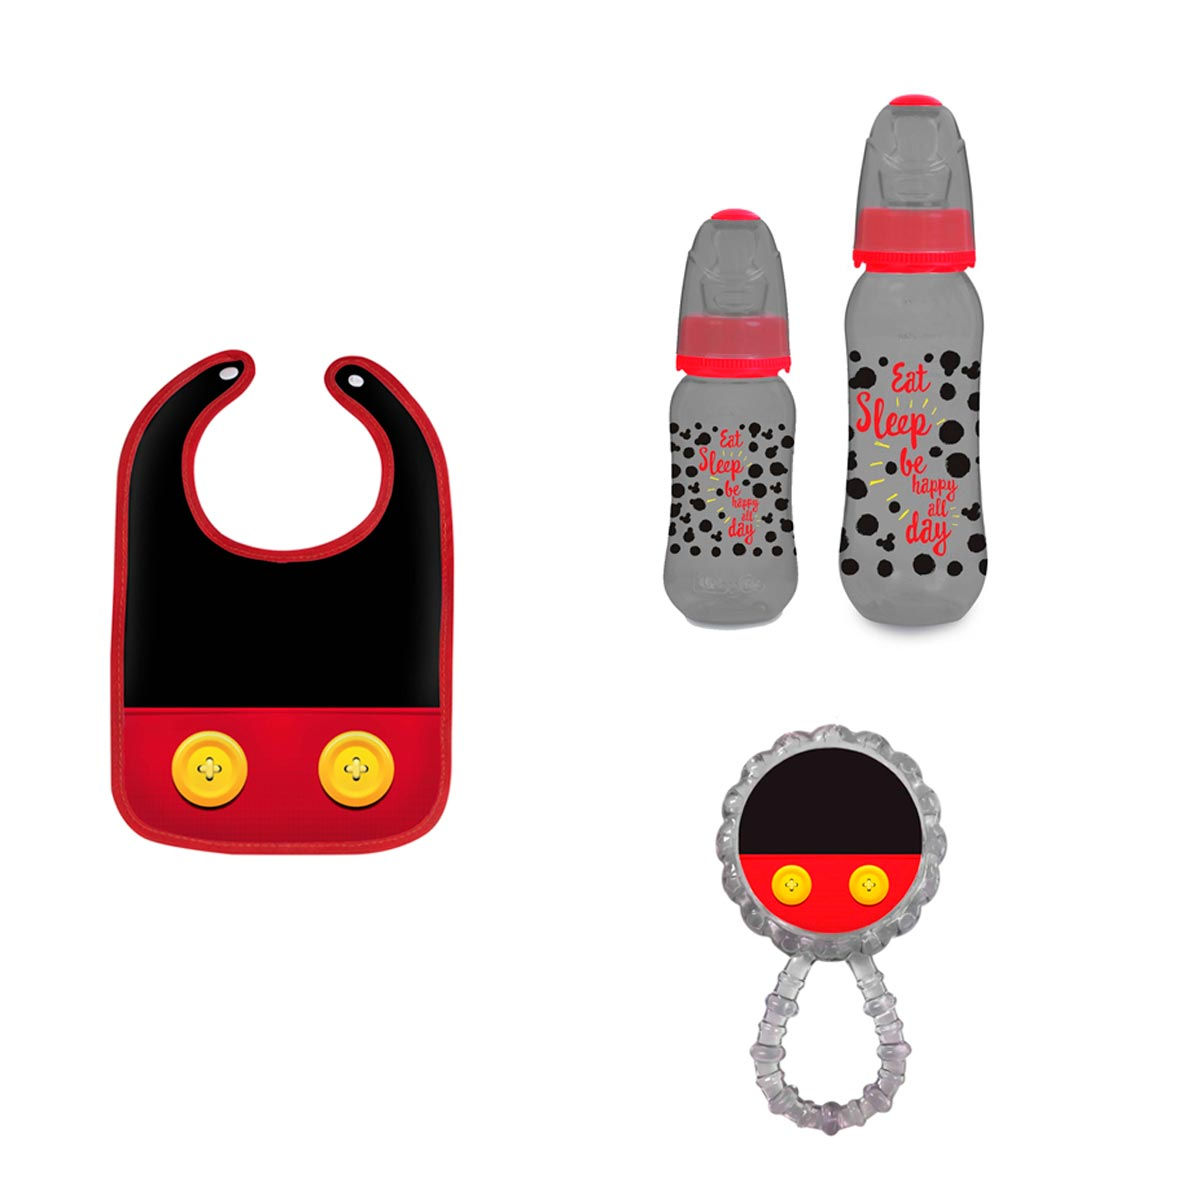 Kit Presente Maternidade Básico Mickey Mouse Disney